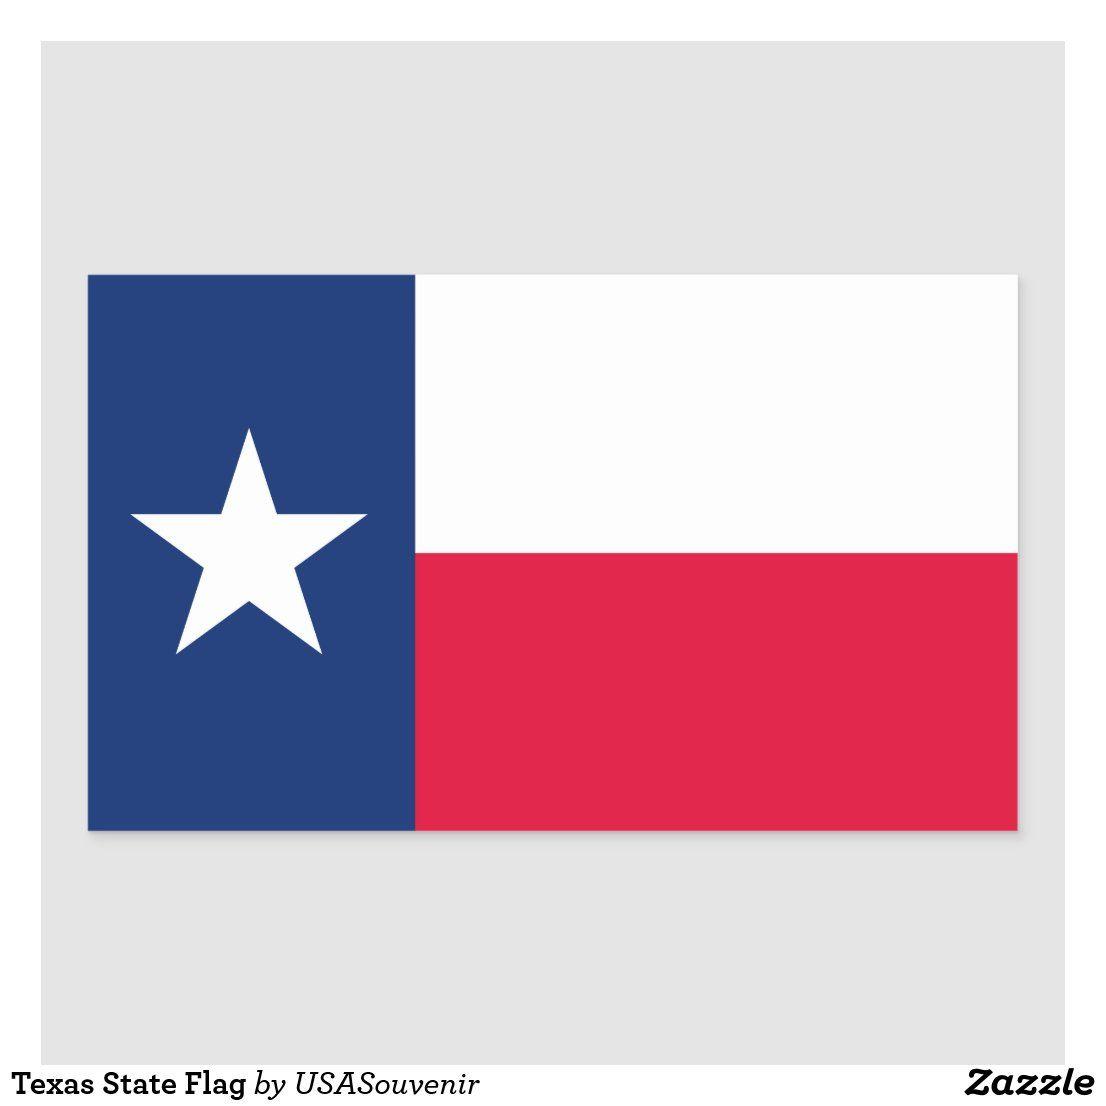 Texas State Flag Rectangular Sticker Zazzle Com In 2020 State Flags Texas State Flag Work Stickers